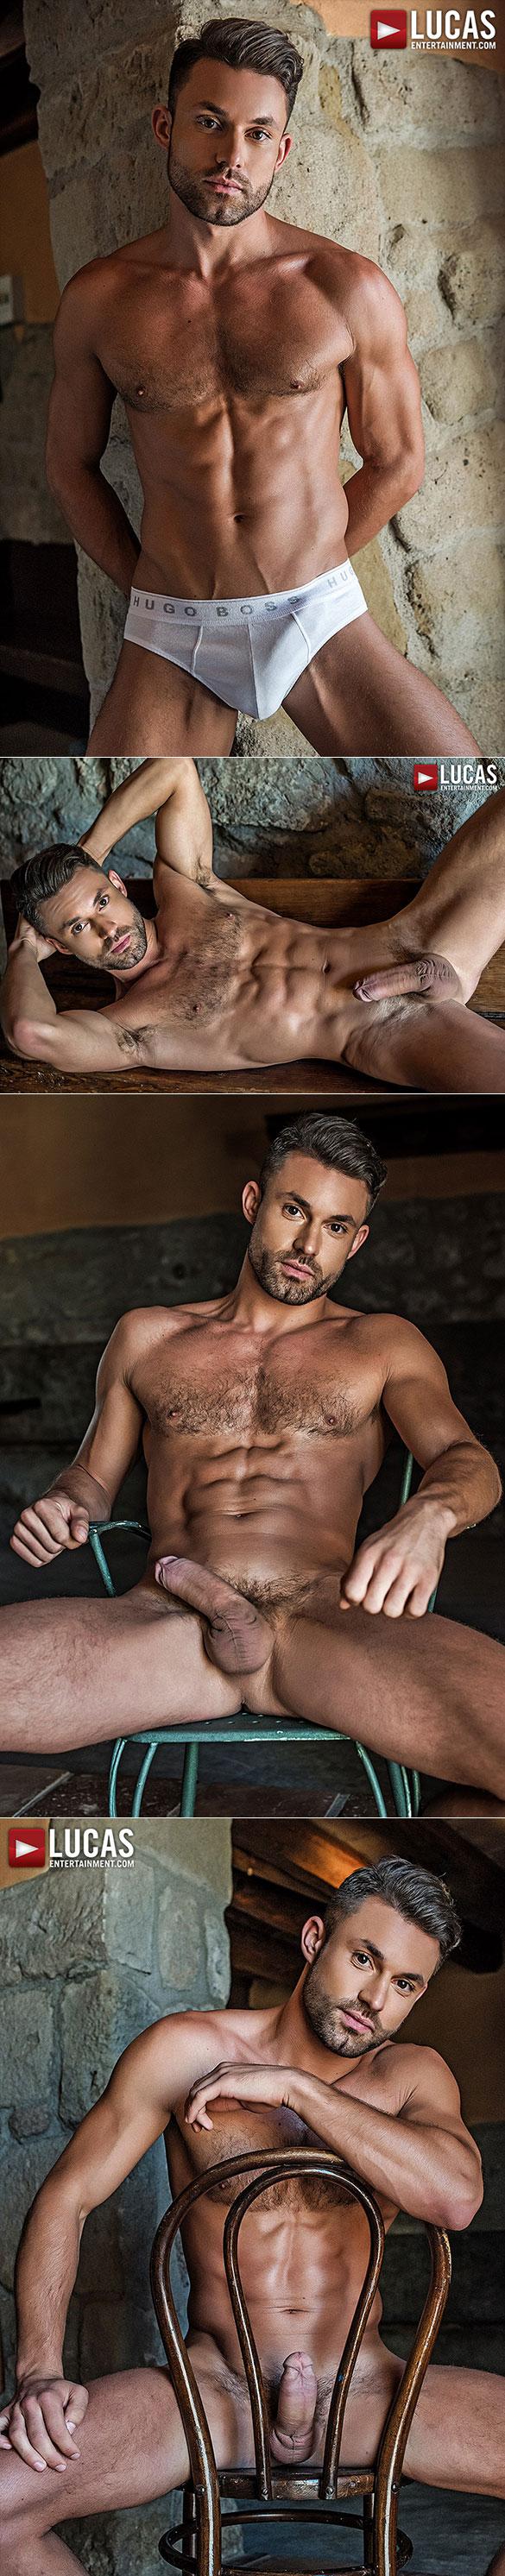 Handsome hunks drills sexy black babe maya bijou from behind 7